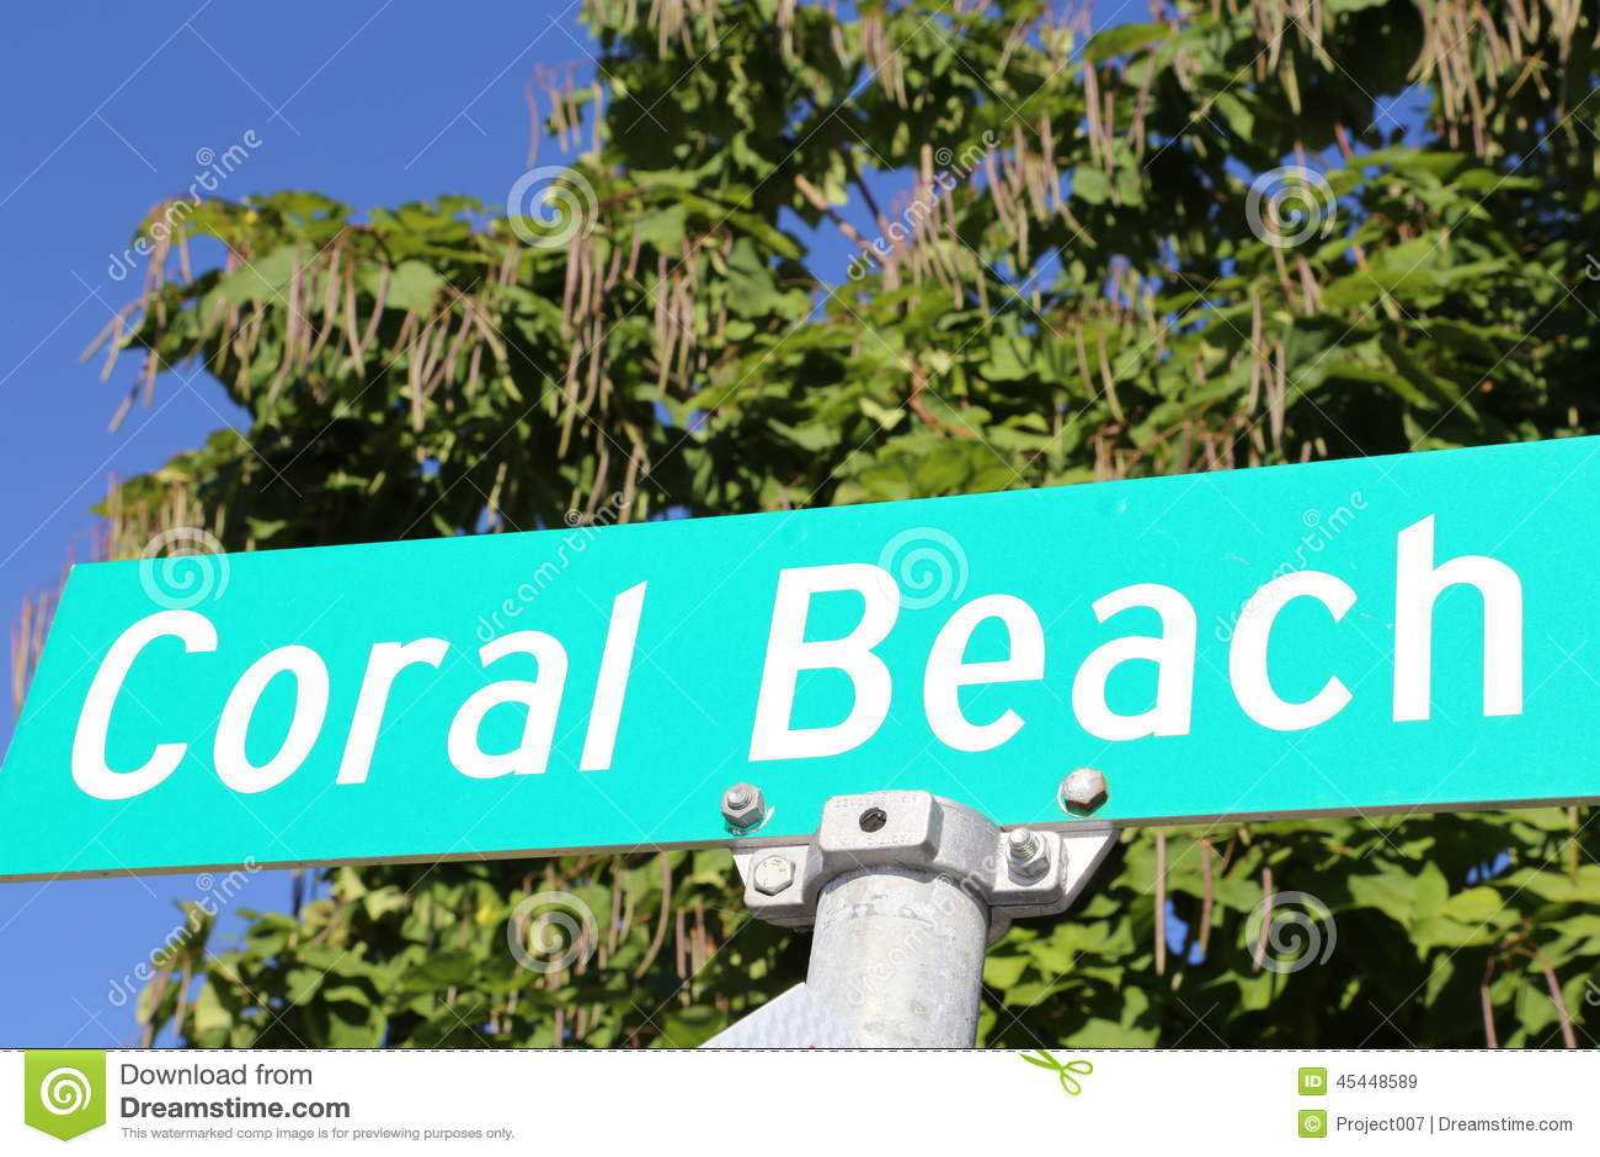 Coral Beach Resort Street Sign Stock Photo